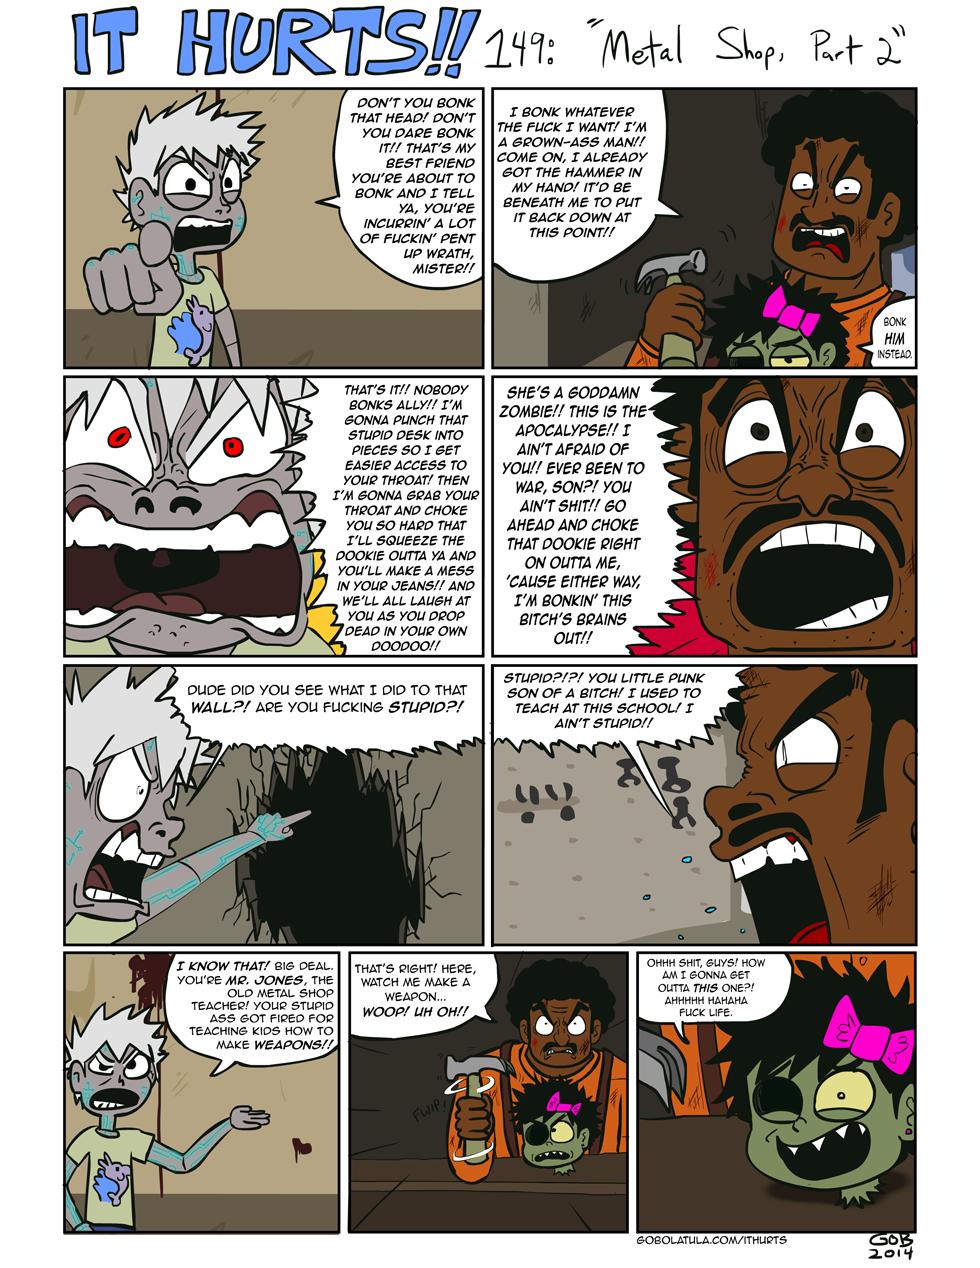 149: Metal Shop, Part 2